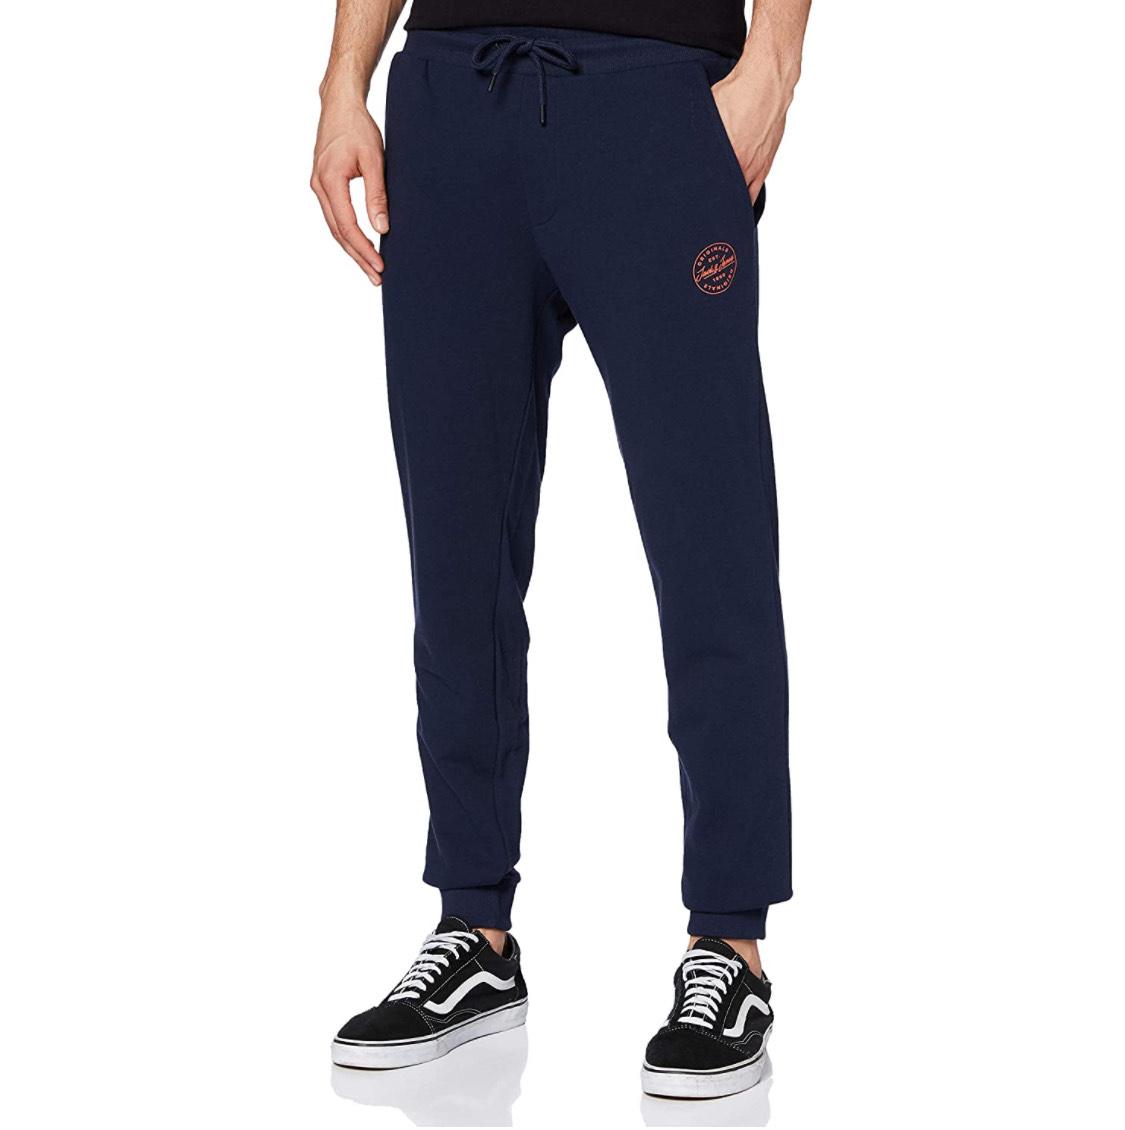 Pantalón deporte azul Jack & Jones adulto talla M.